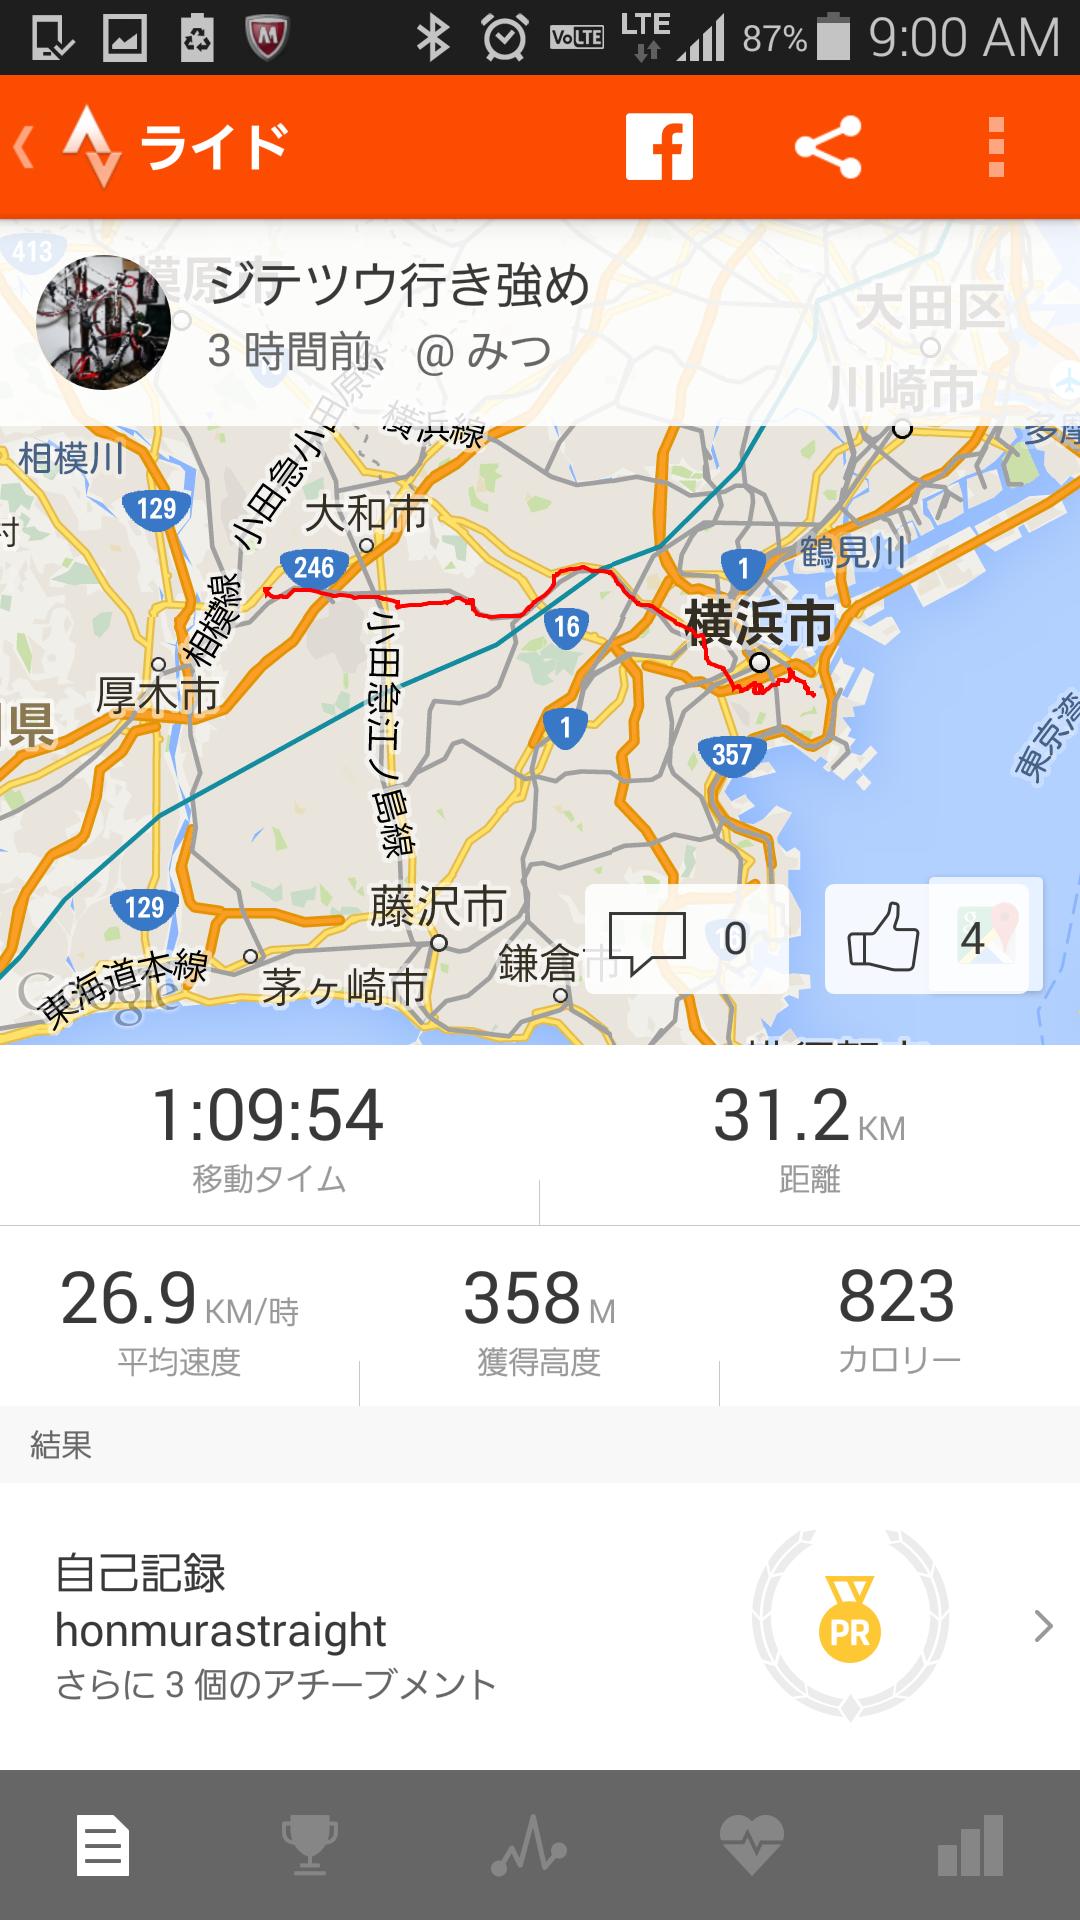 Screenshot_2015-05-14-09-00-01.png